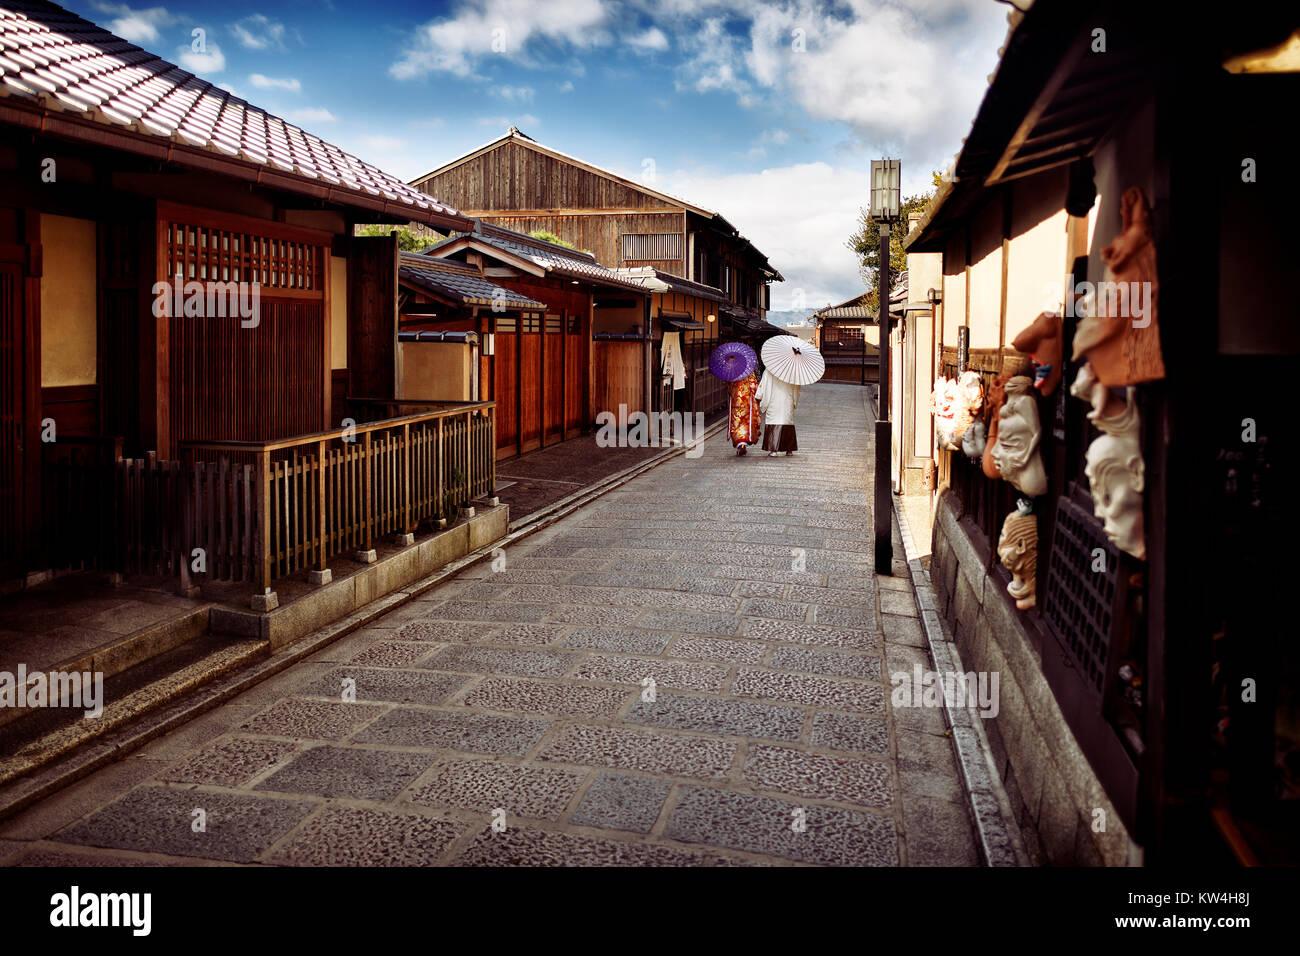 Couple with Japanese parasols wearing traditional kimono walking down an old street, Yasaka dori, near Kiyomizu - Stock Image